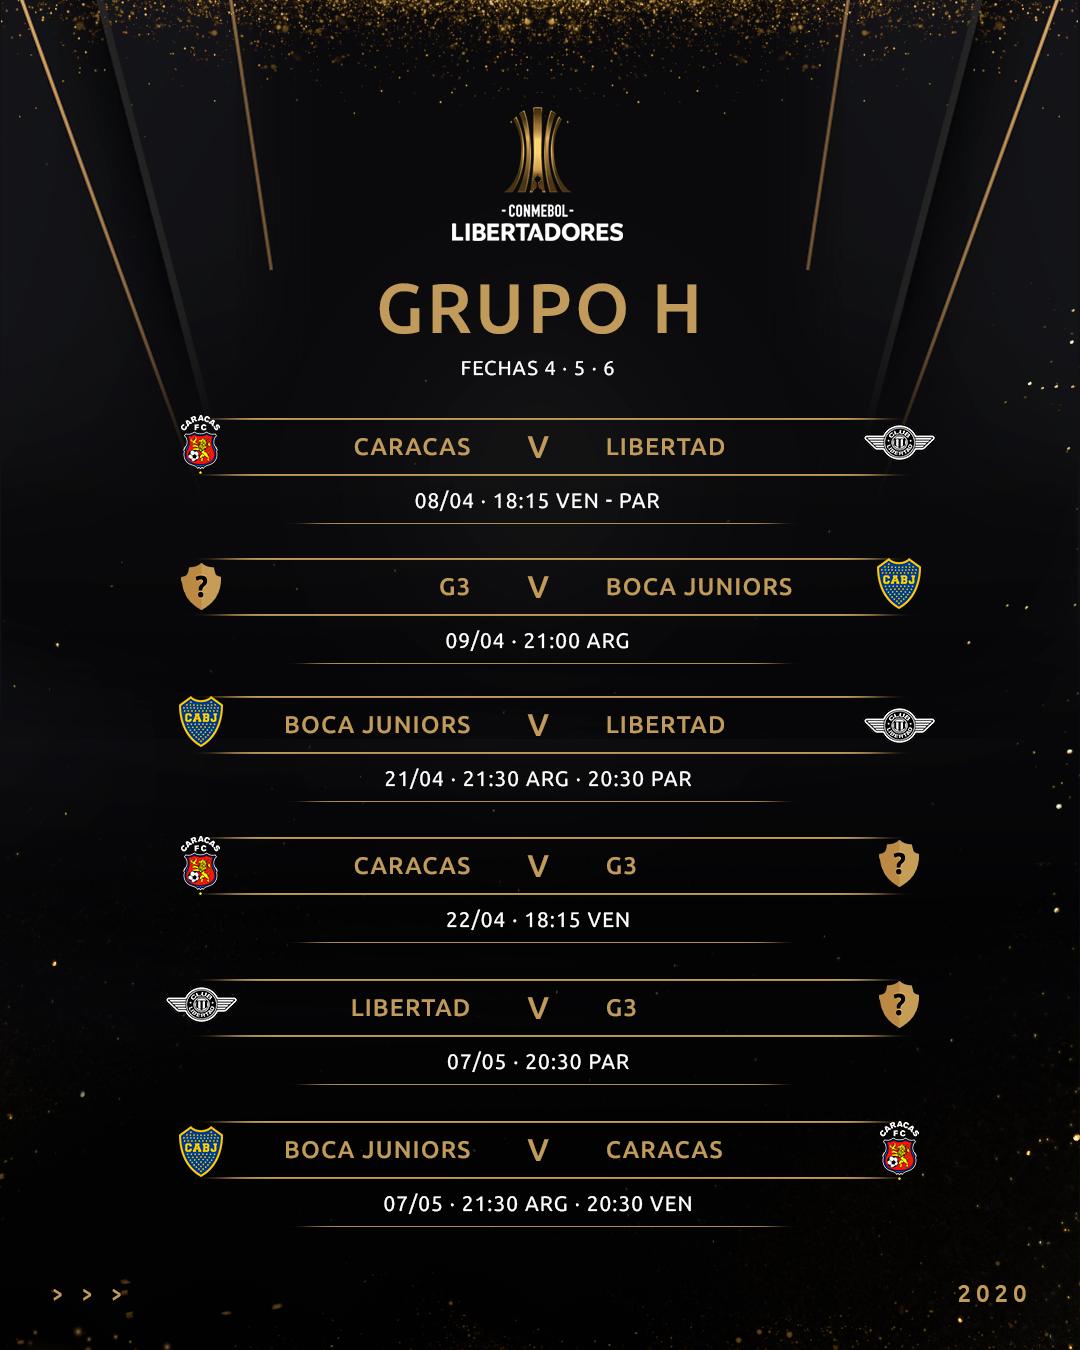 Grupo H Fixture